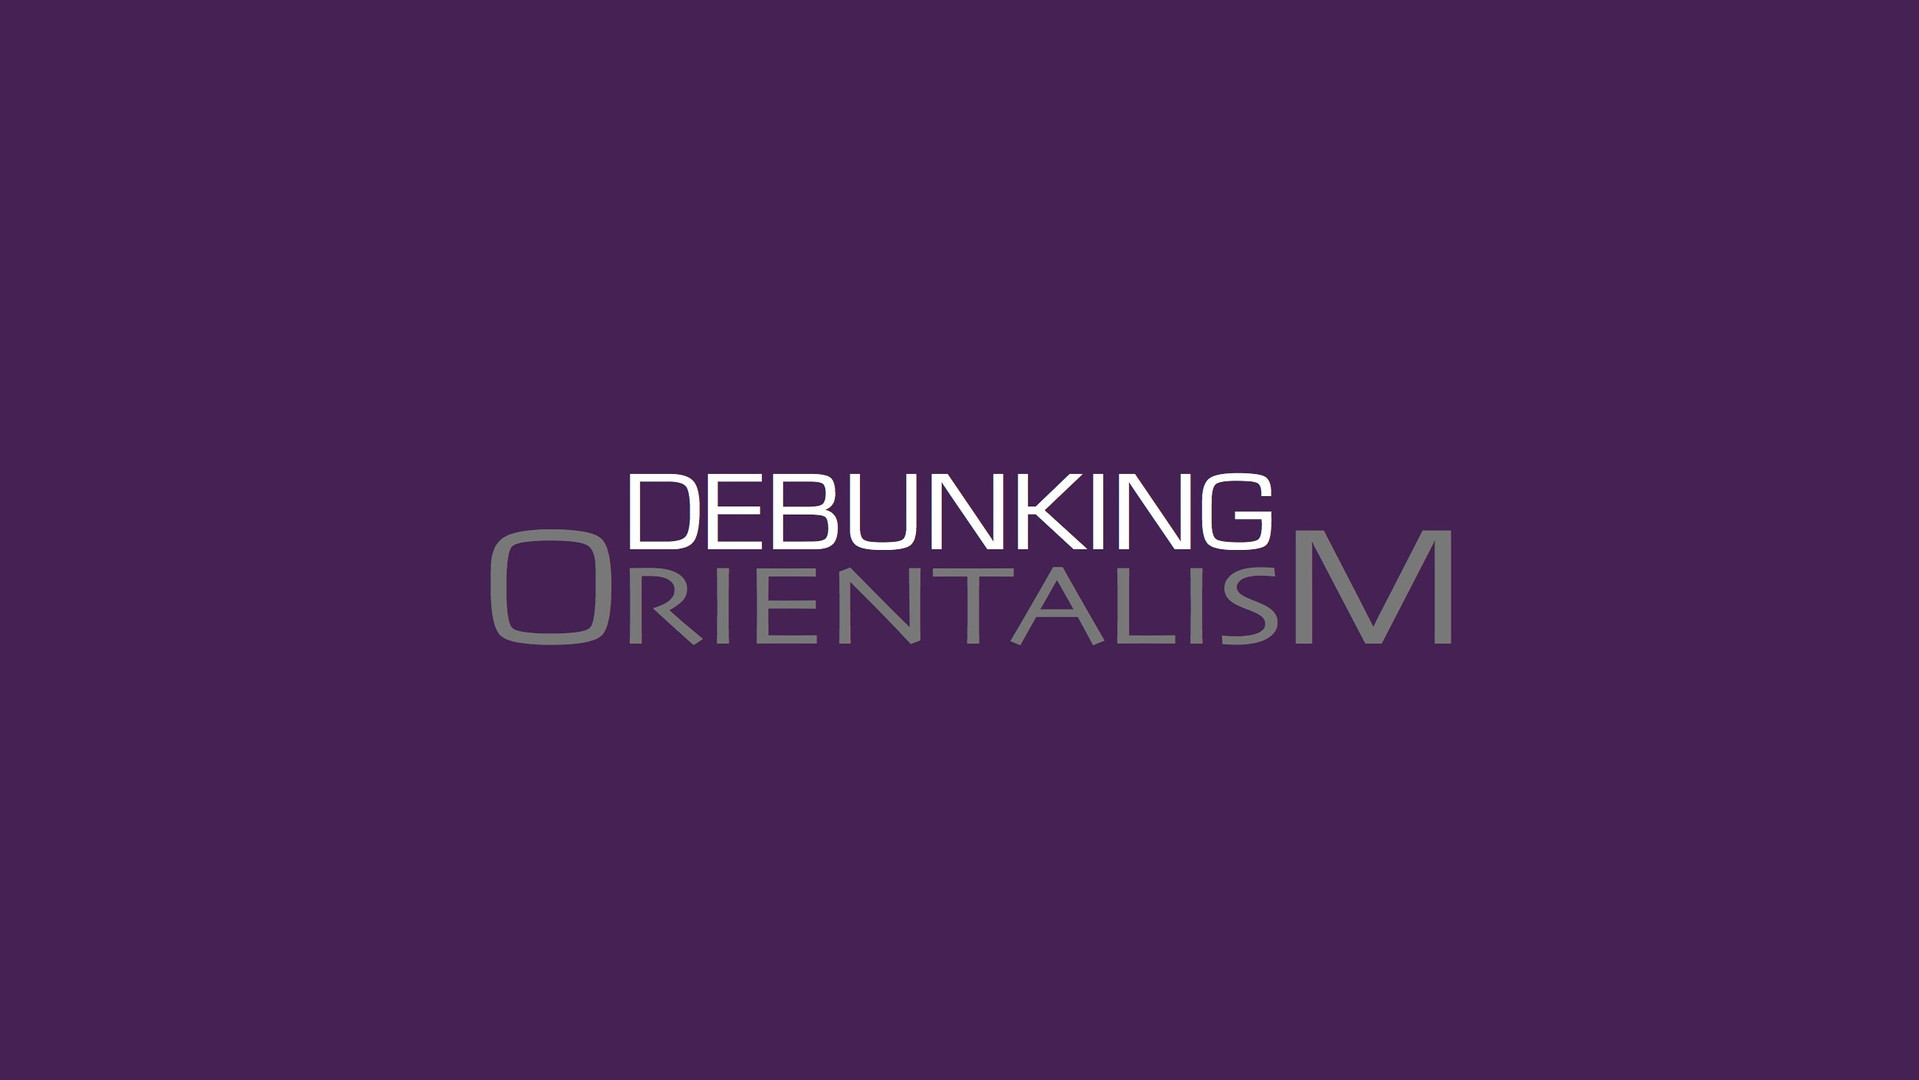 Debunking Orientalism